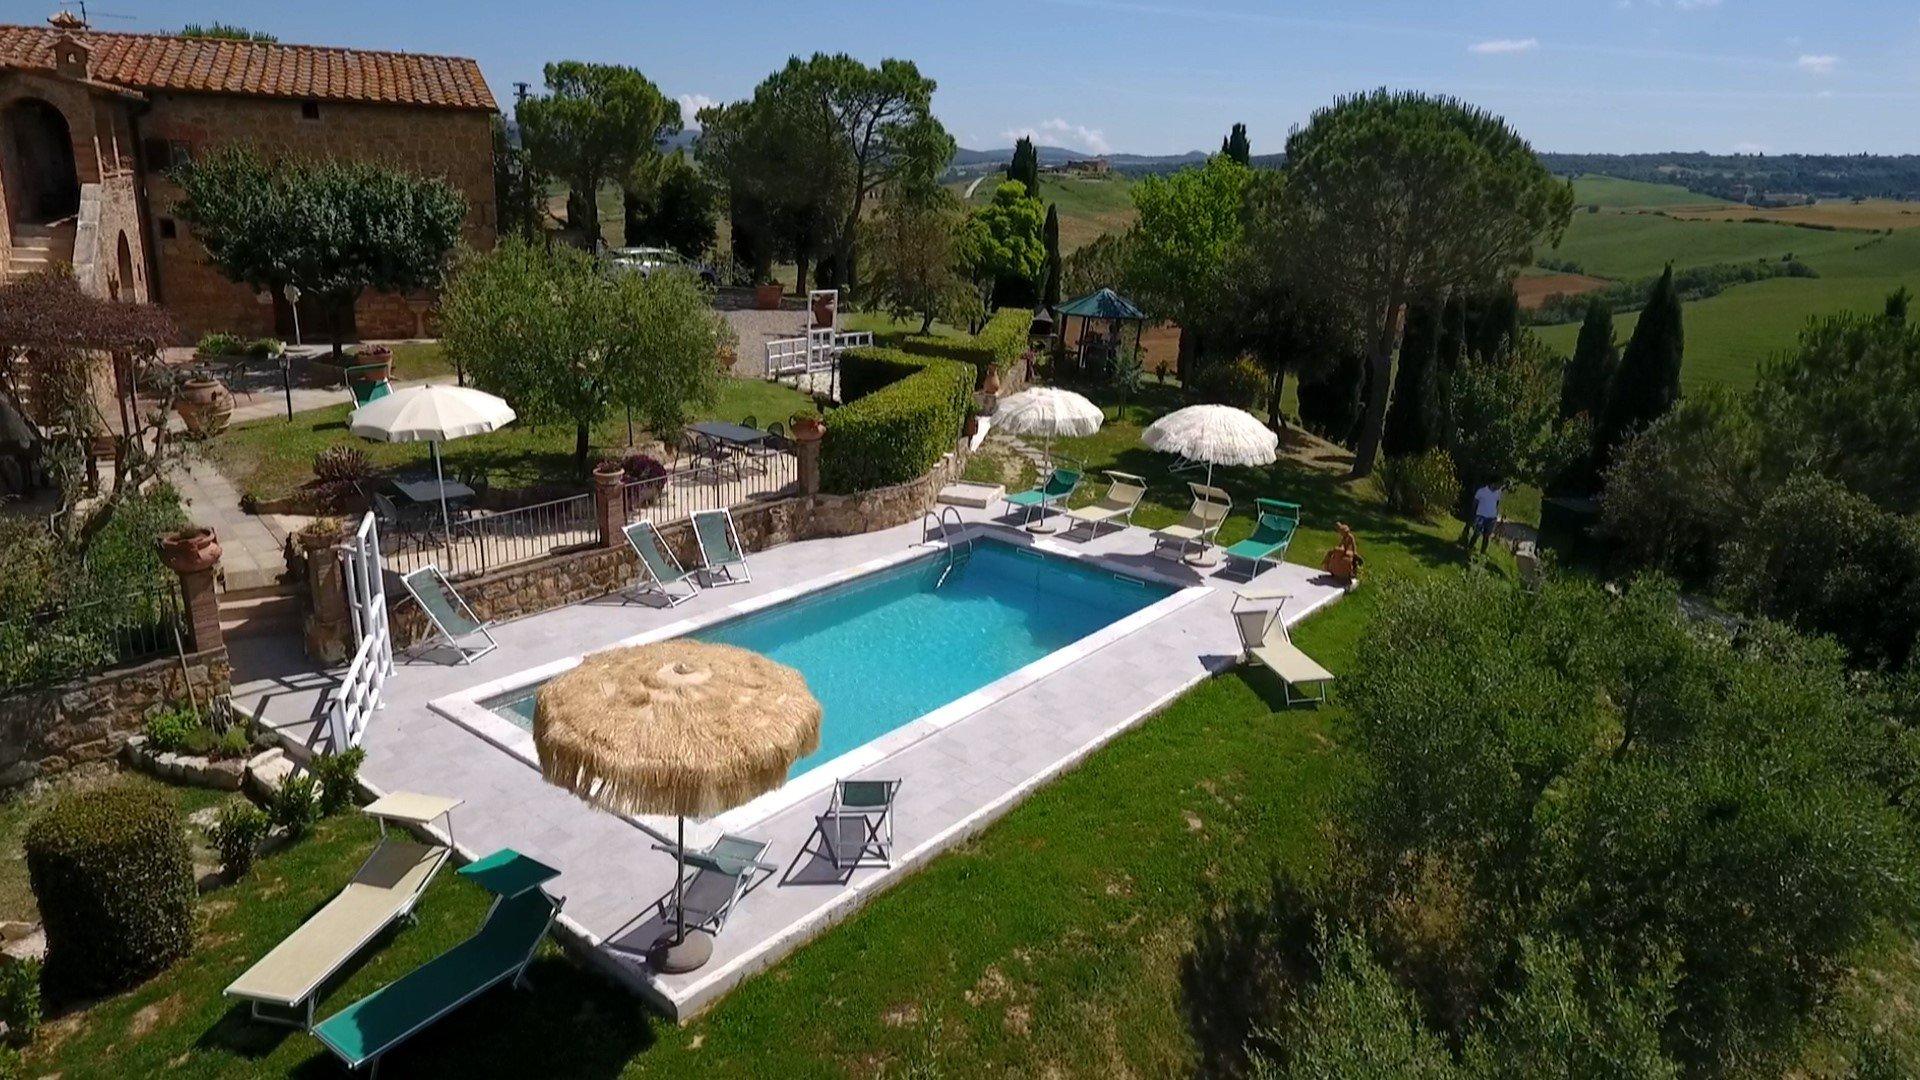 Palazzo-Conti-Zwembad met parasols.jpg